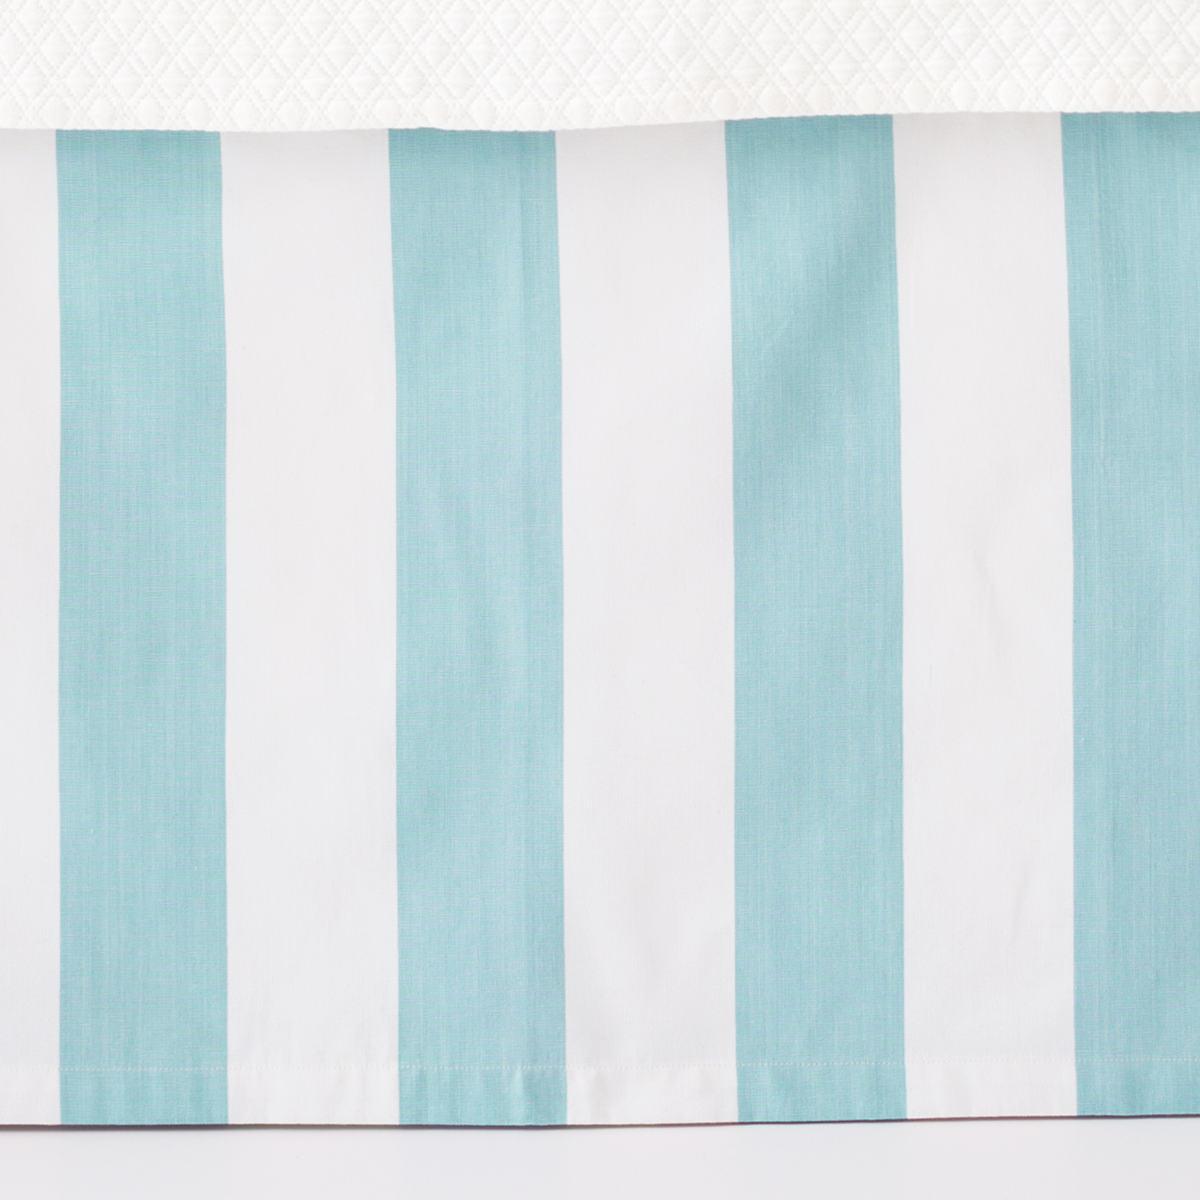 Alex Sky Paneled Bed Skirt